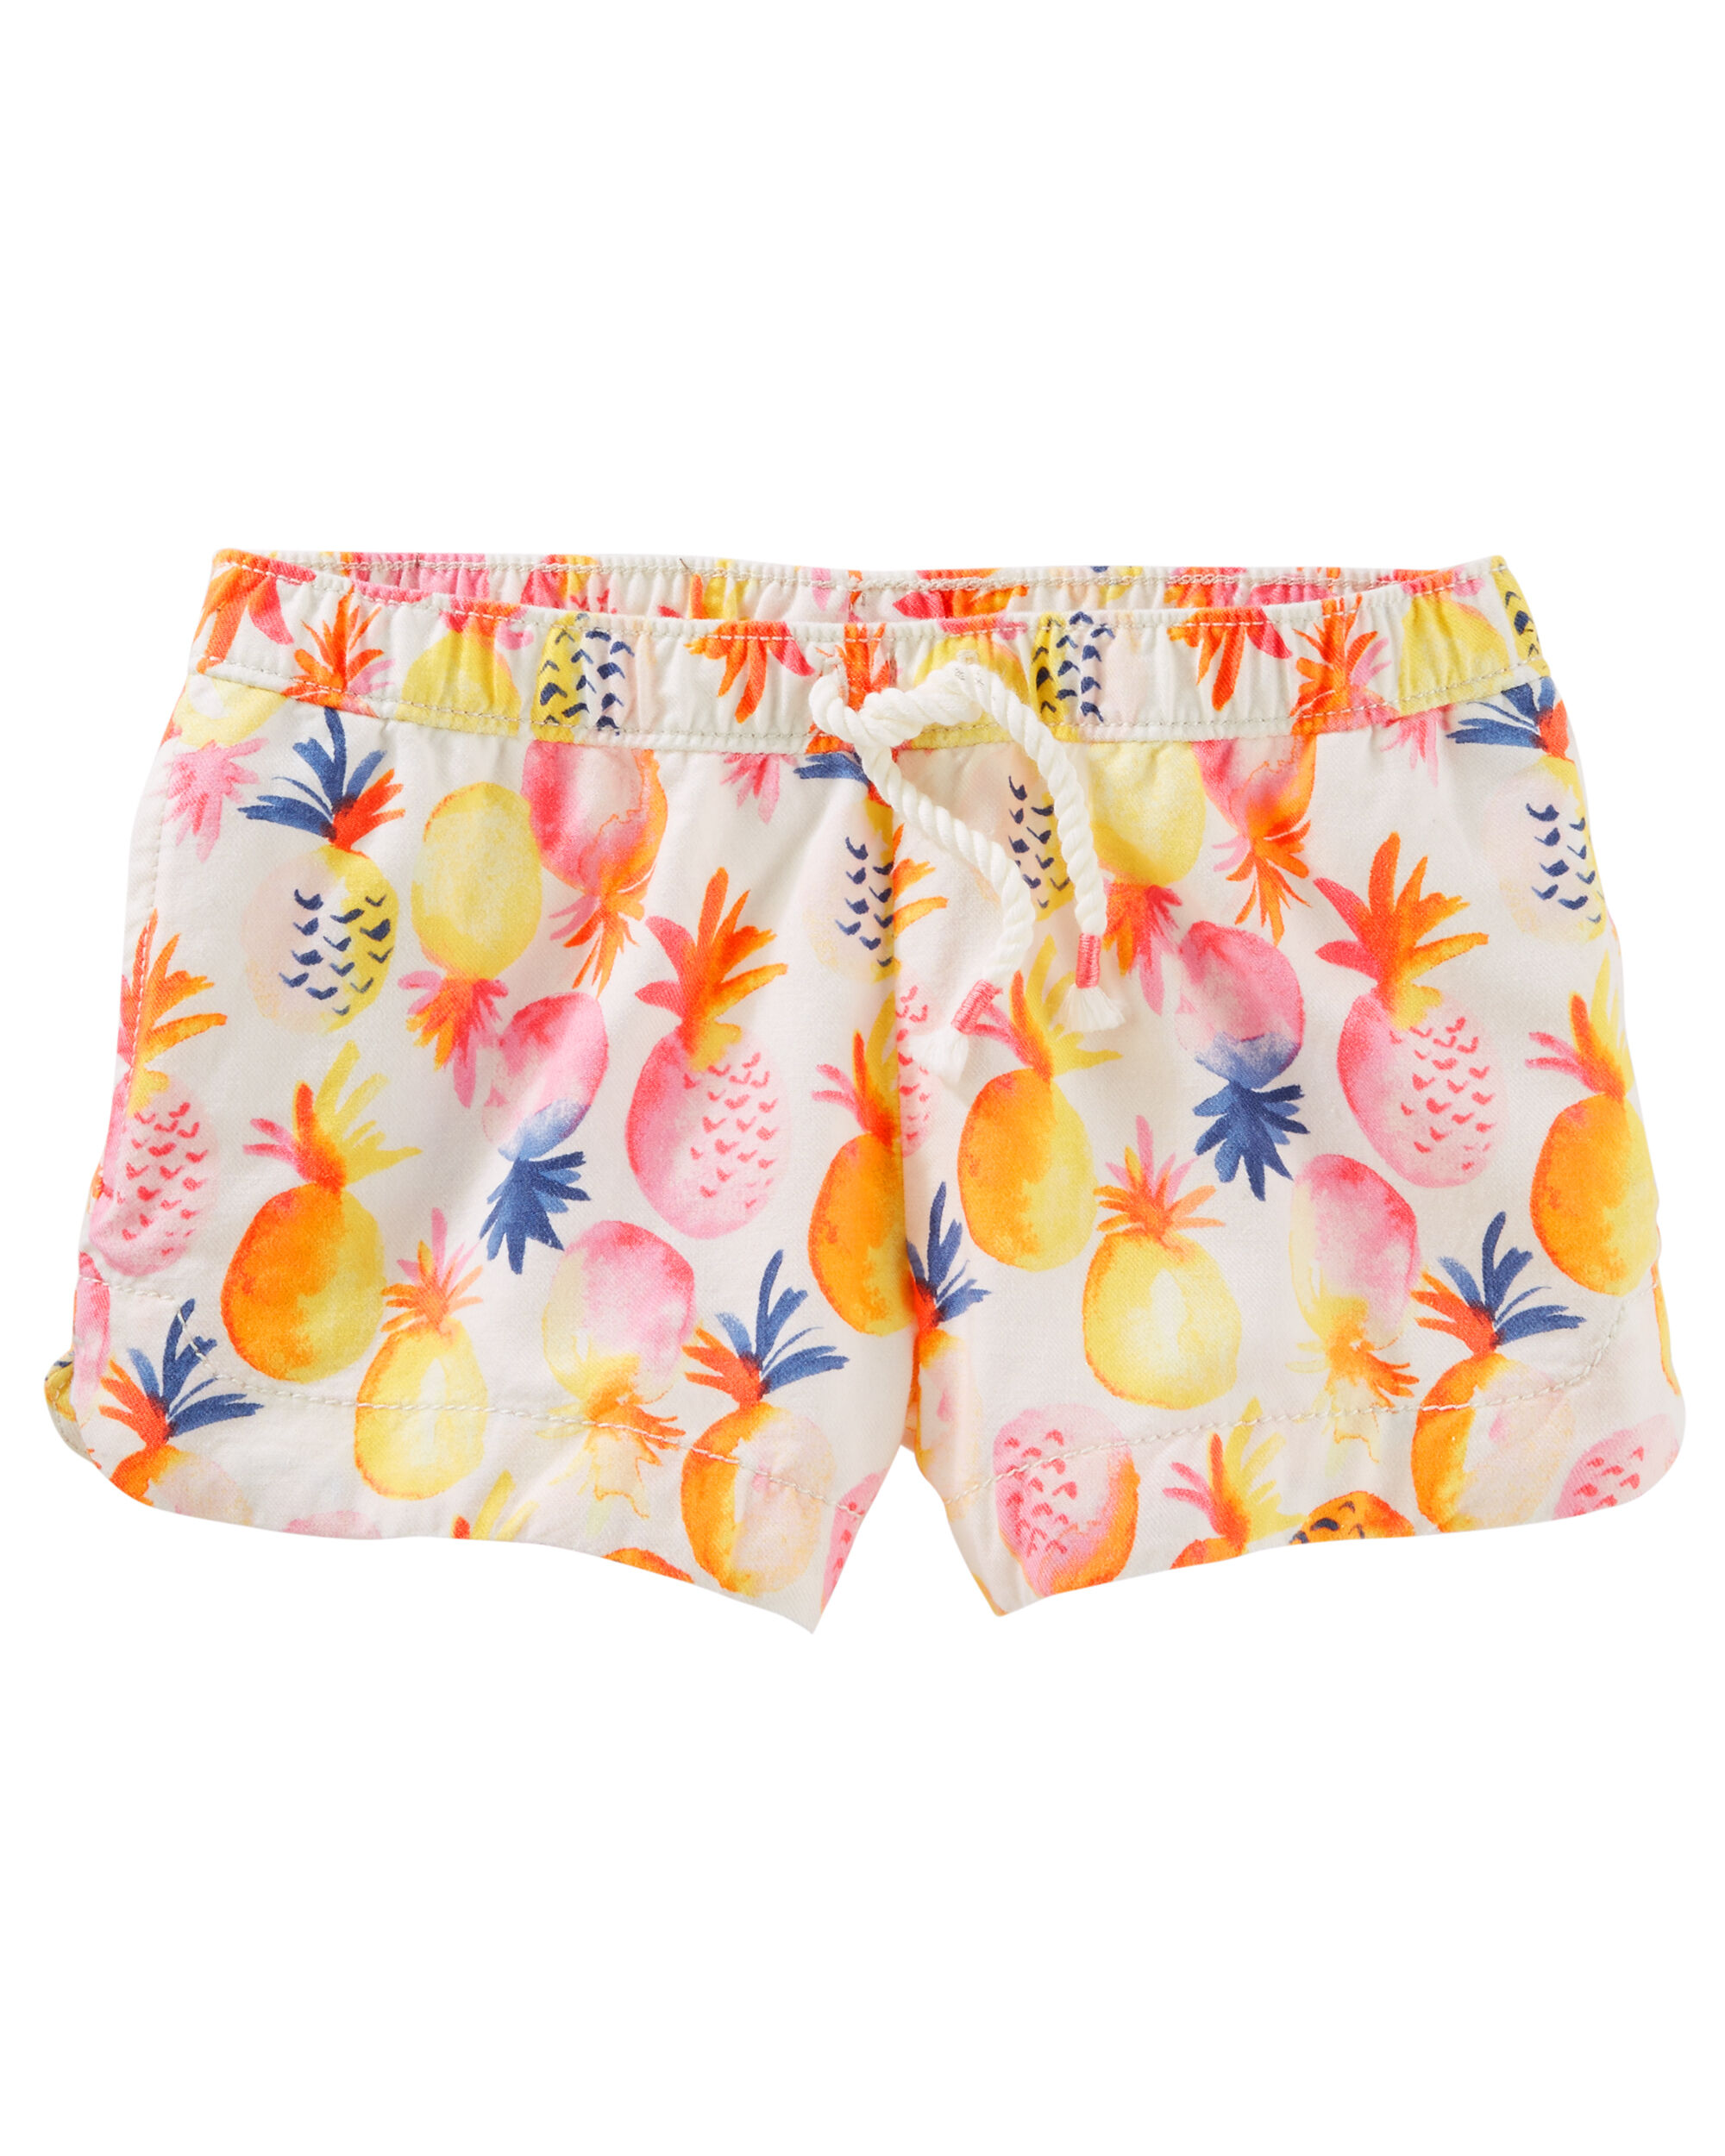 Pineapple Print Sun Shorts